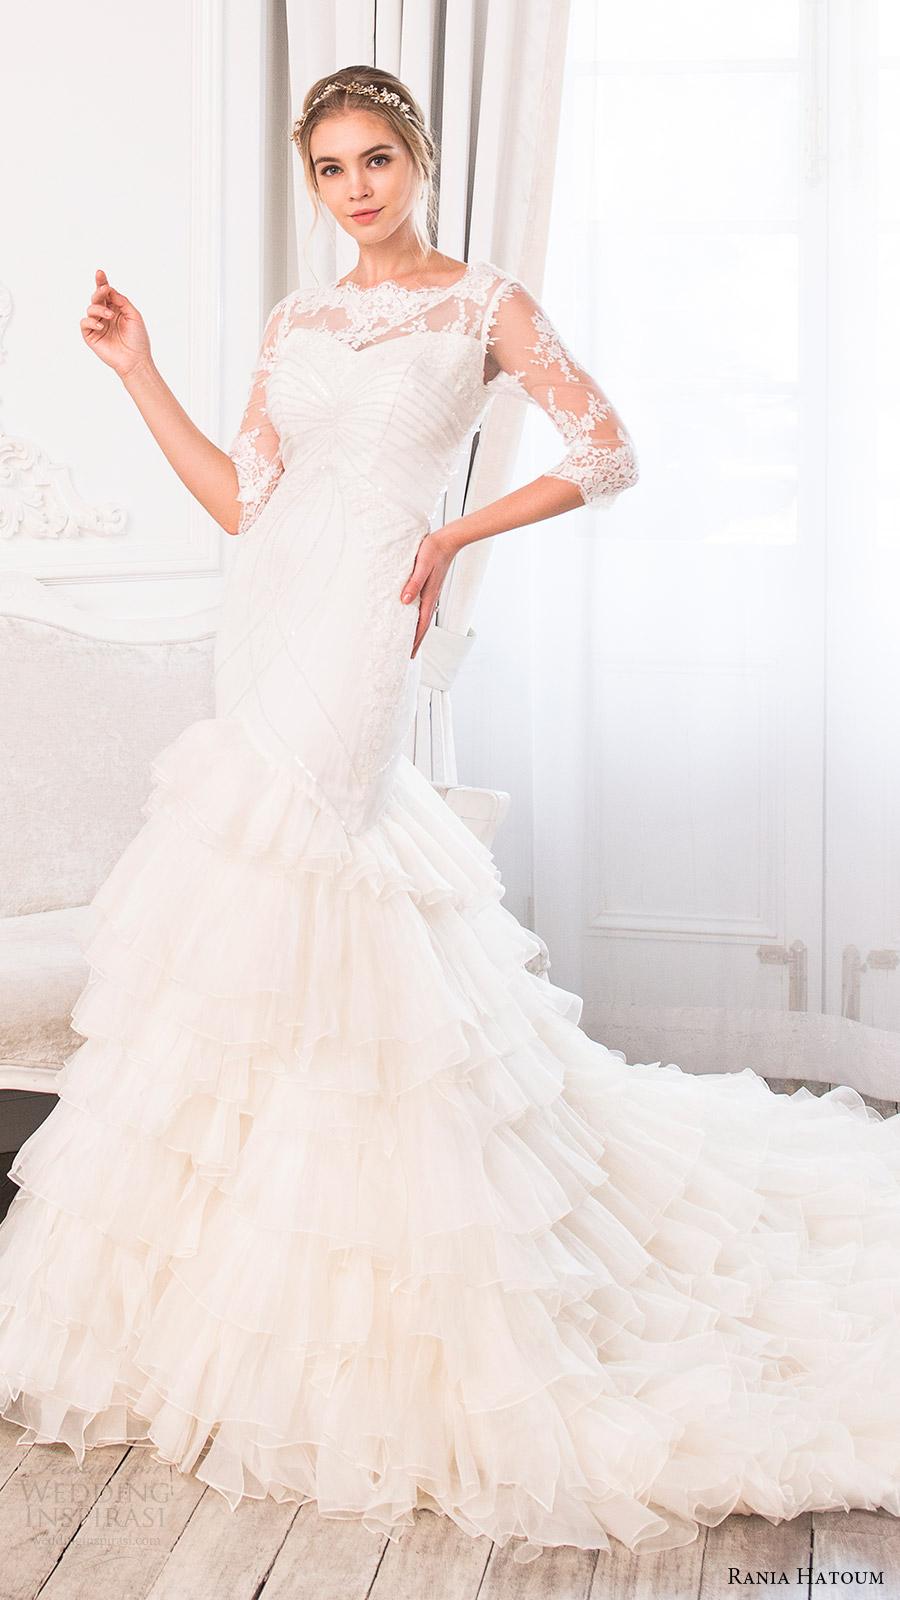 rania hatoum bridal spring 2017 illusion 3 quarter sleeves bateau neckline mermaid wedding dress (carrie) mv ruffle skirt train